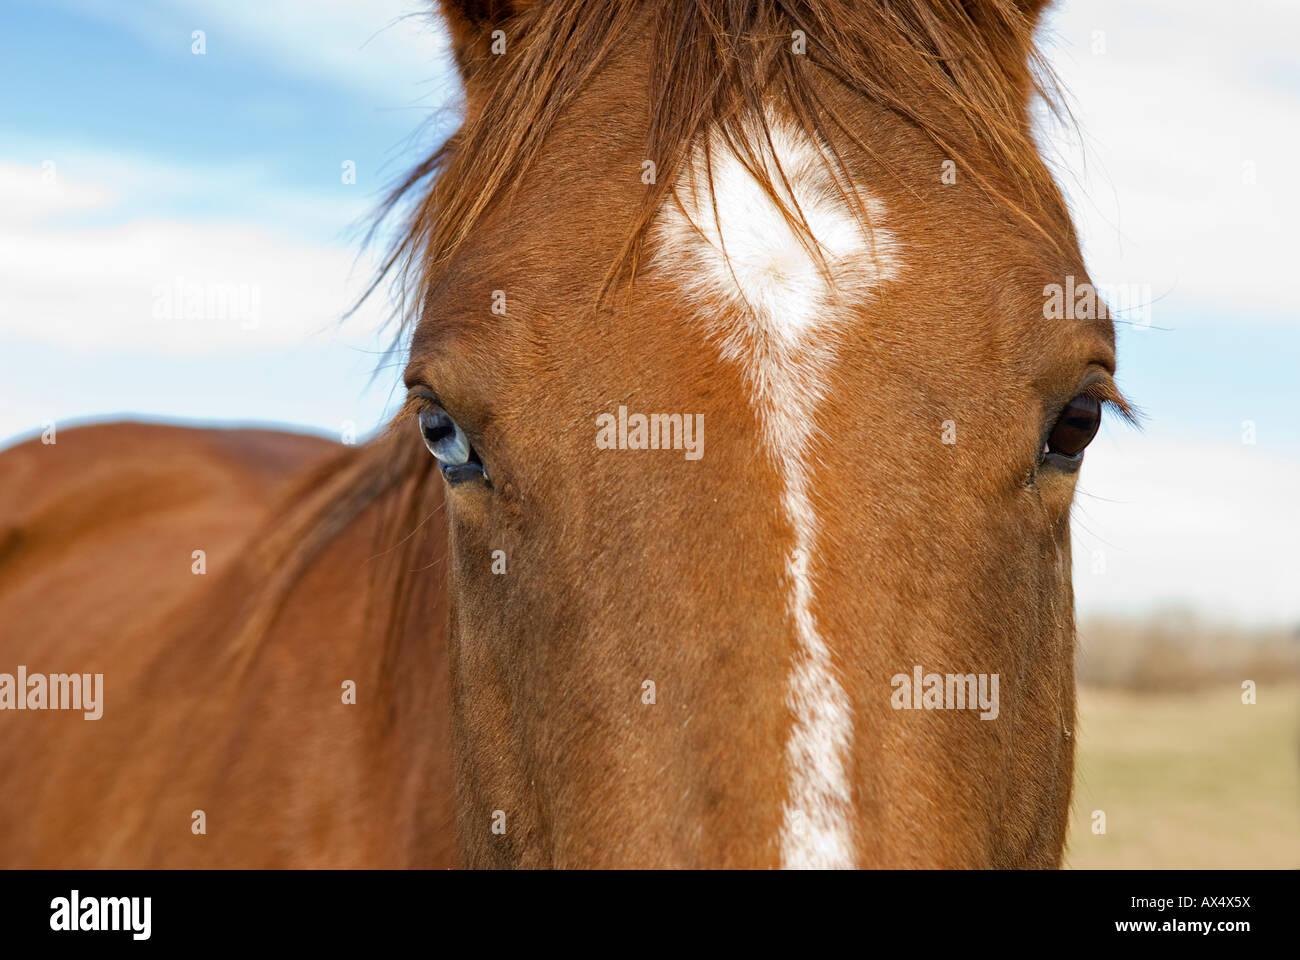 5071 best images about Horses on Pinterest   Dressage